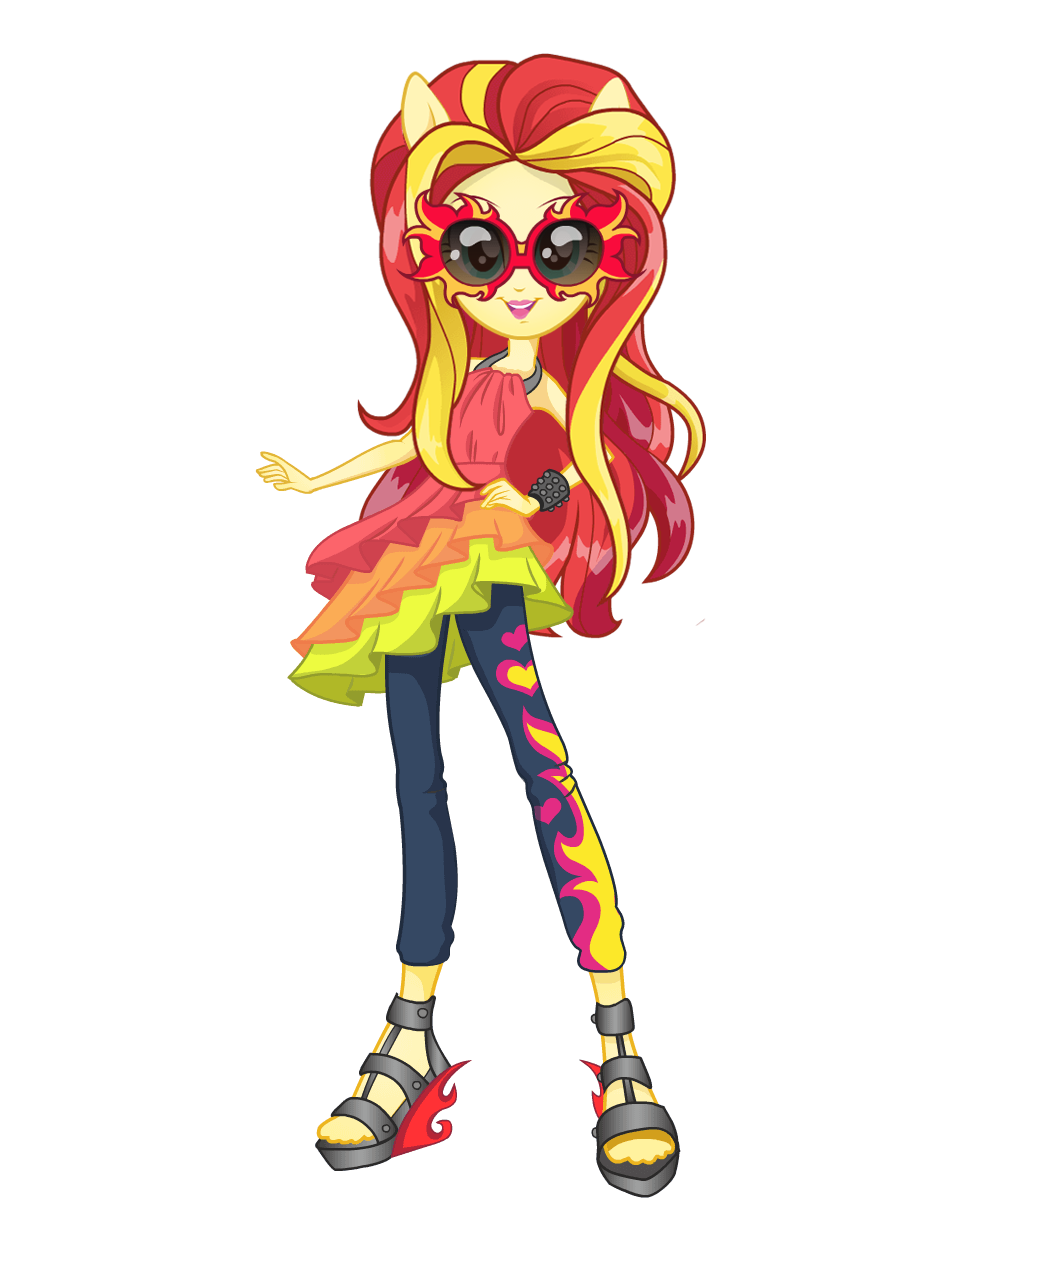 Mlp Eg2 Rainbowrocks Sunset Shimmer New Look By Ytpinkiepie2 On Deviantart My Little Pony Pictures My Little Pony Collection Sunset Shimmer